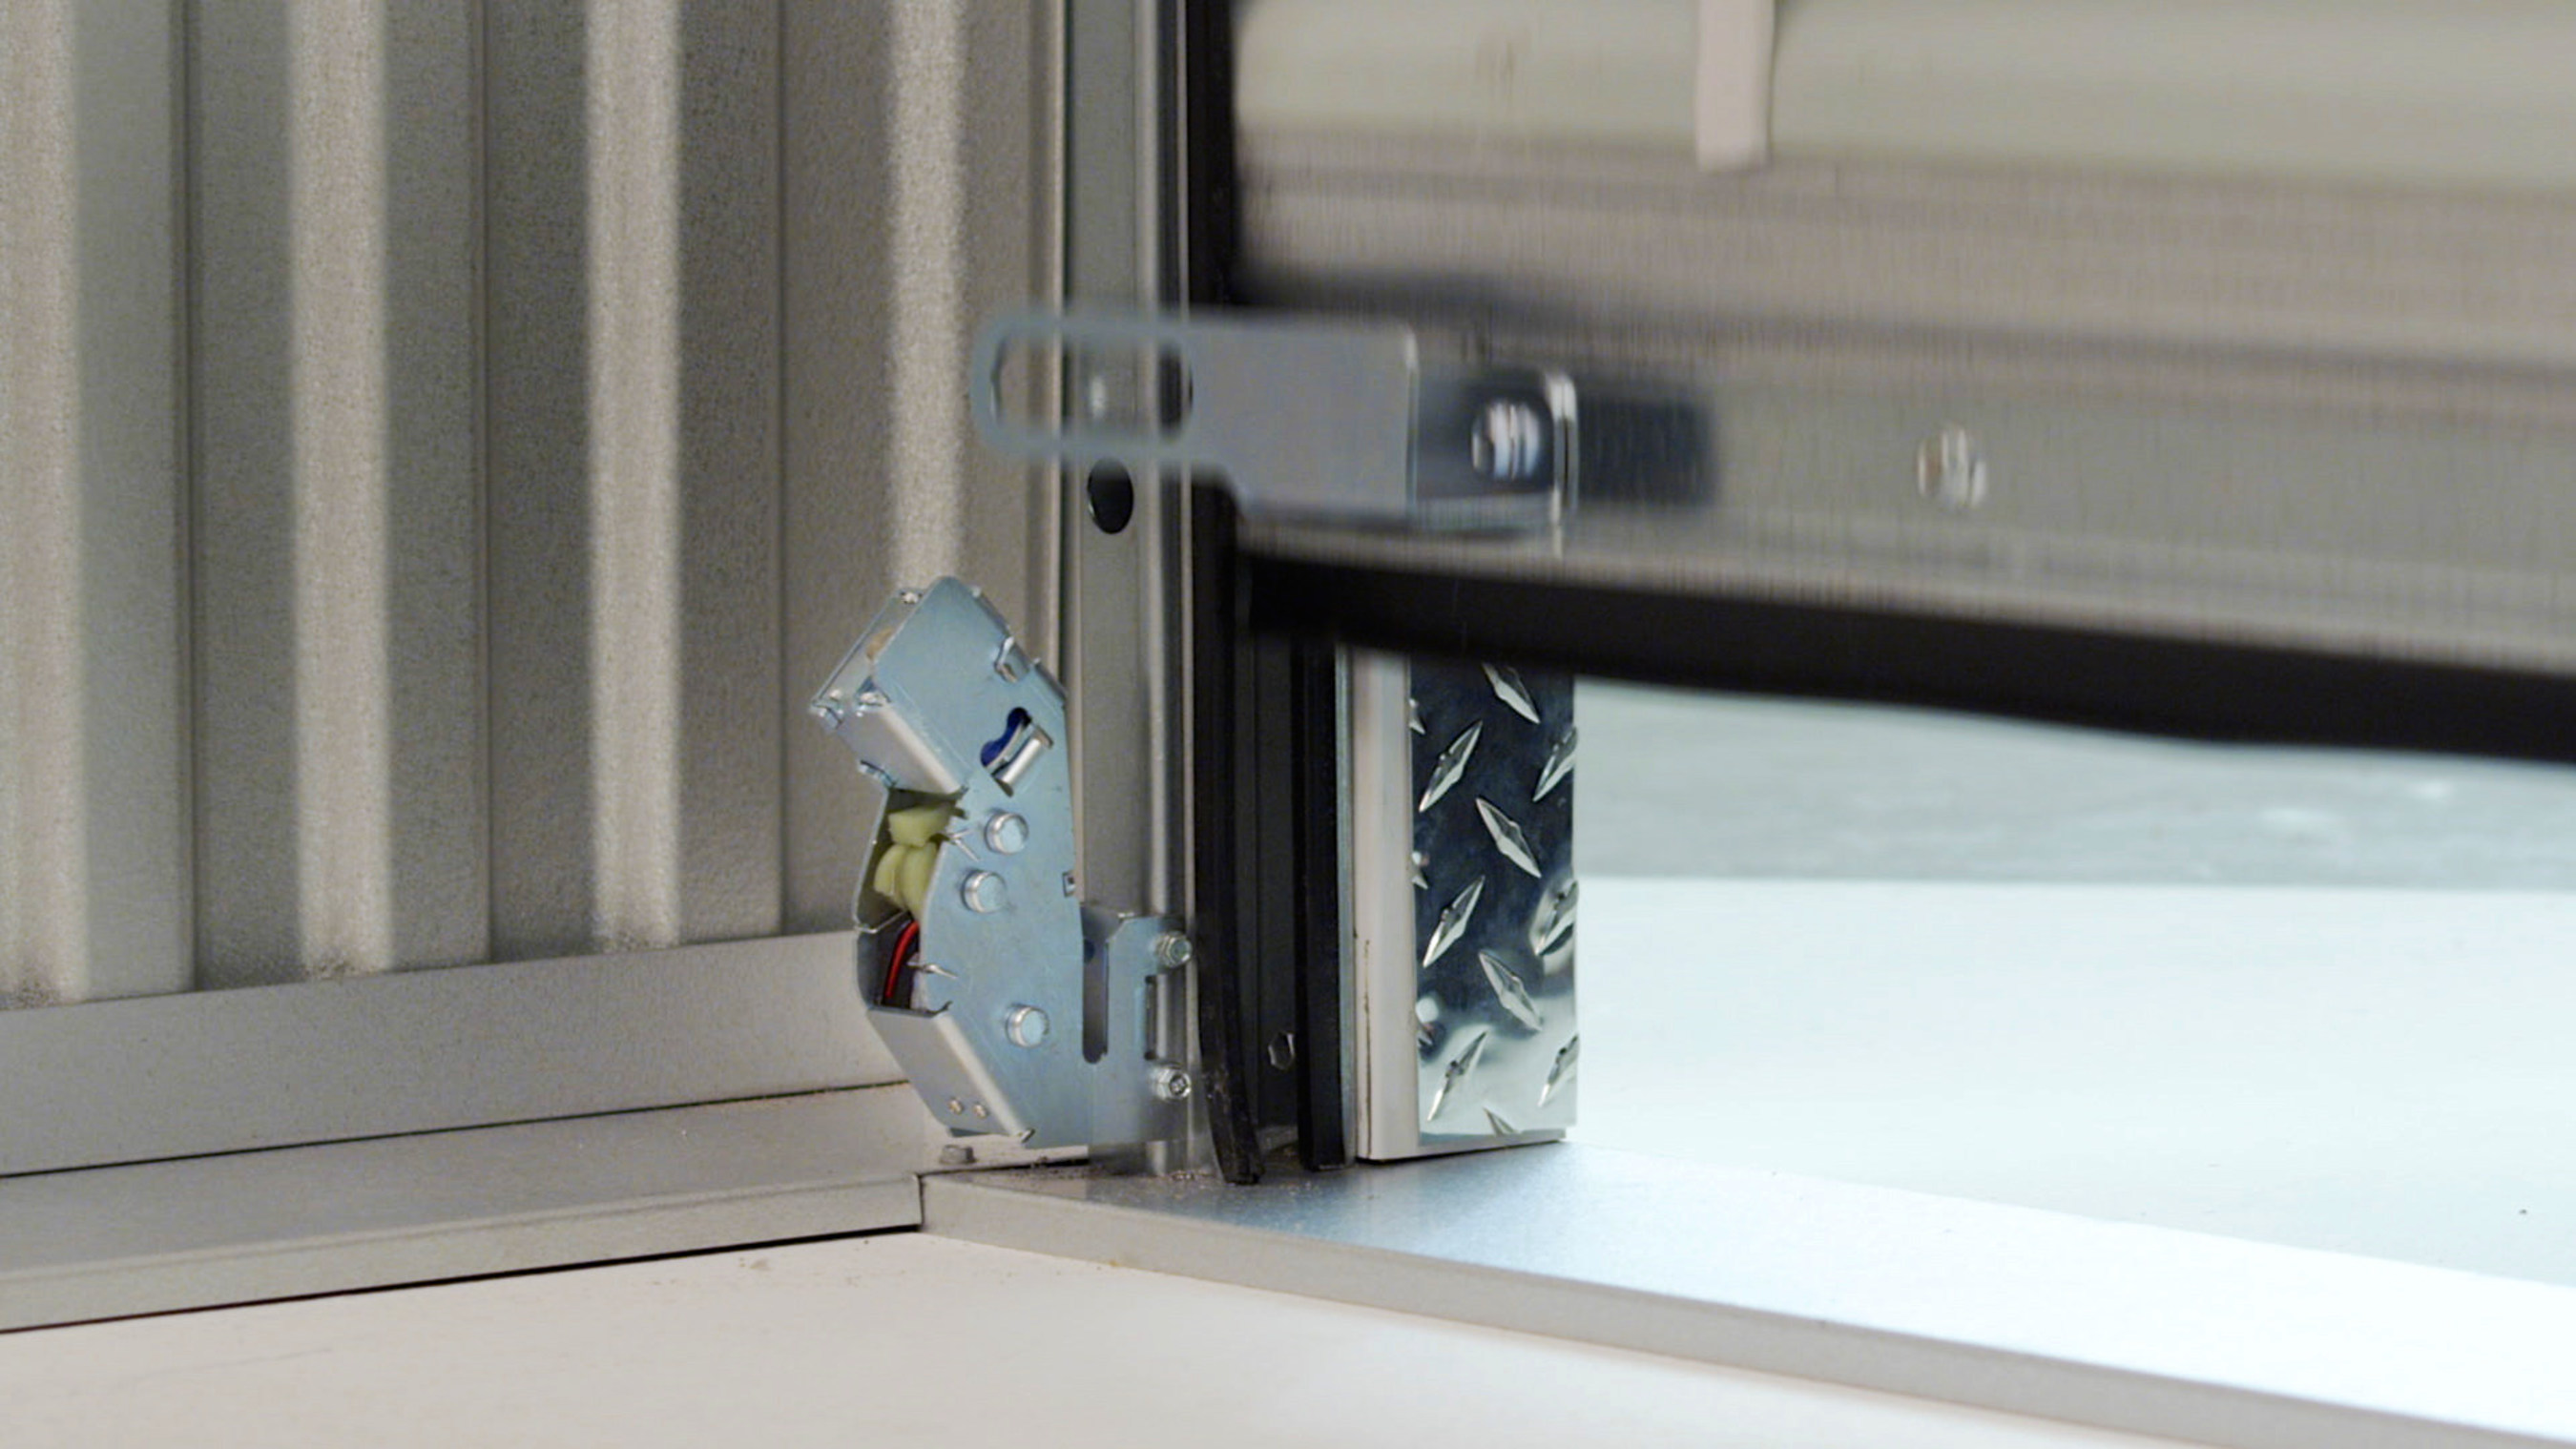 Geymsla24 Implements Janus International's SecurGuard Electronic Lock Solution